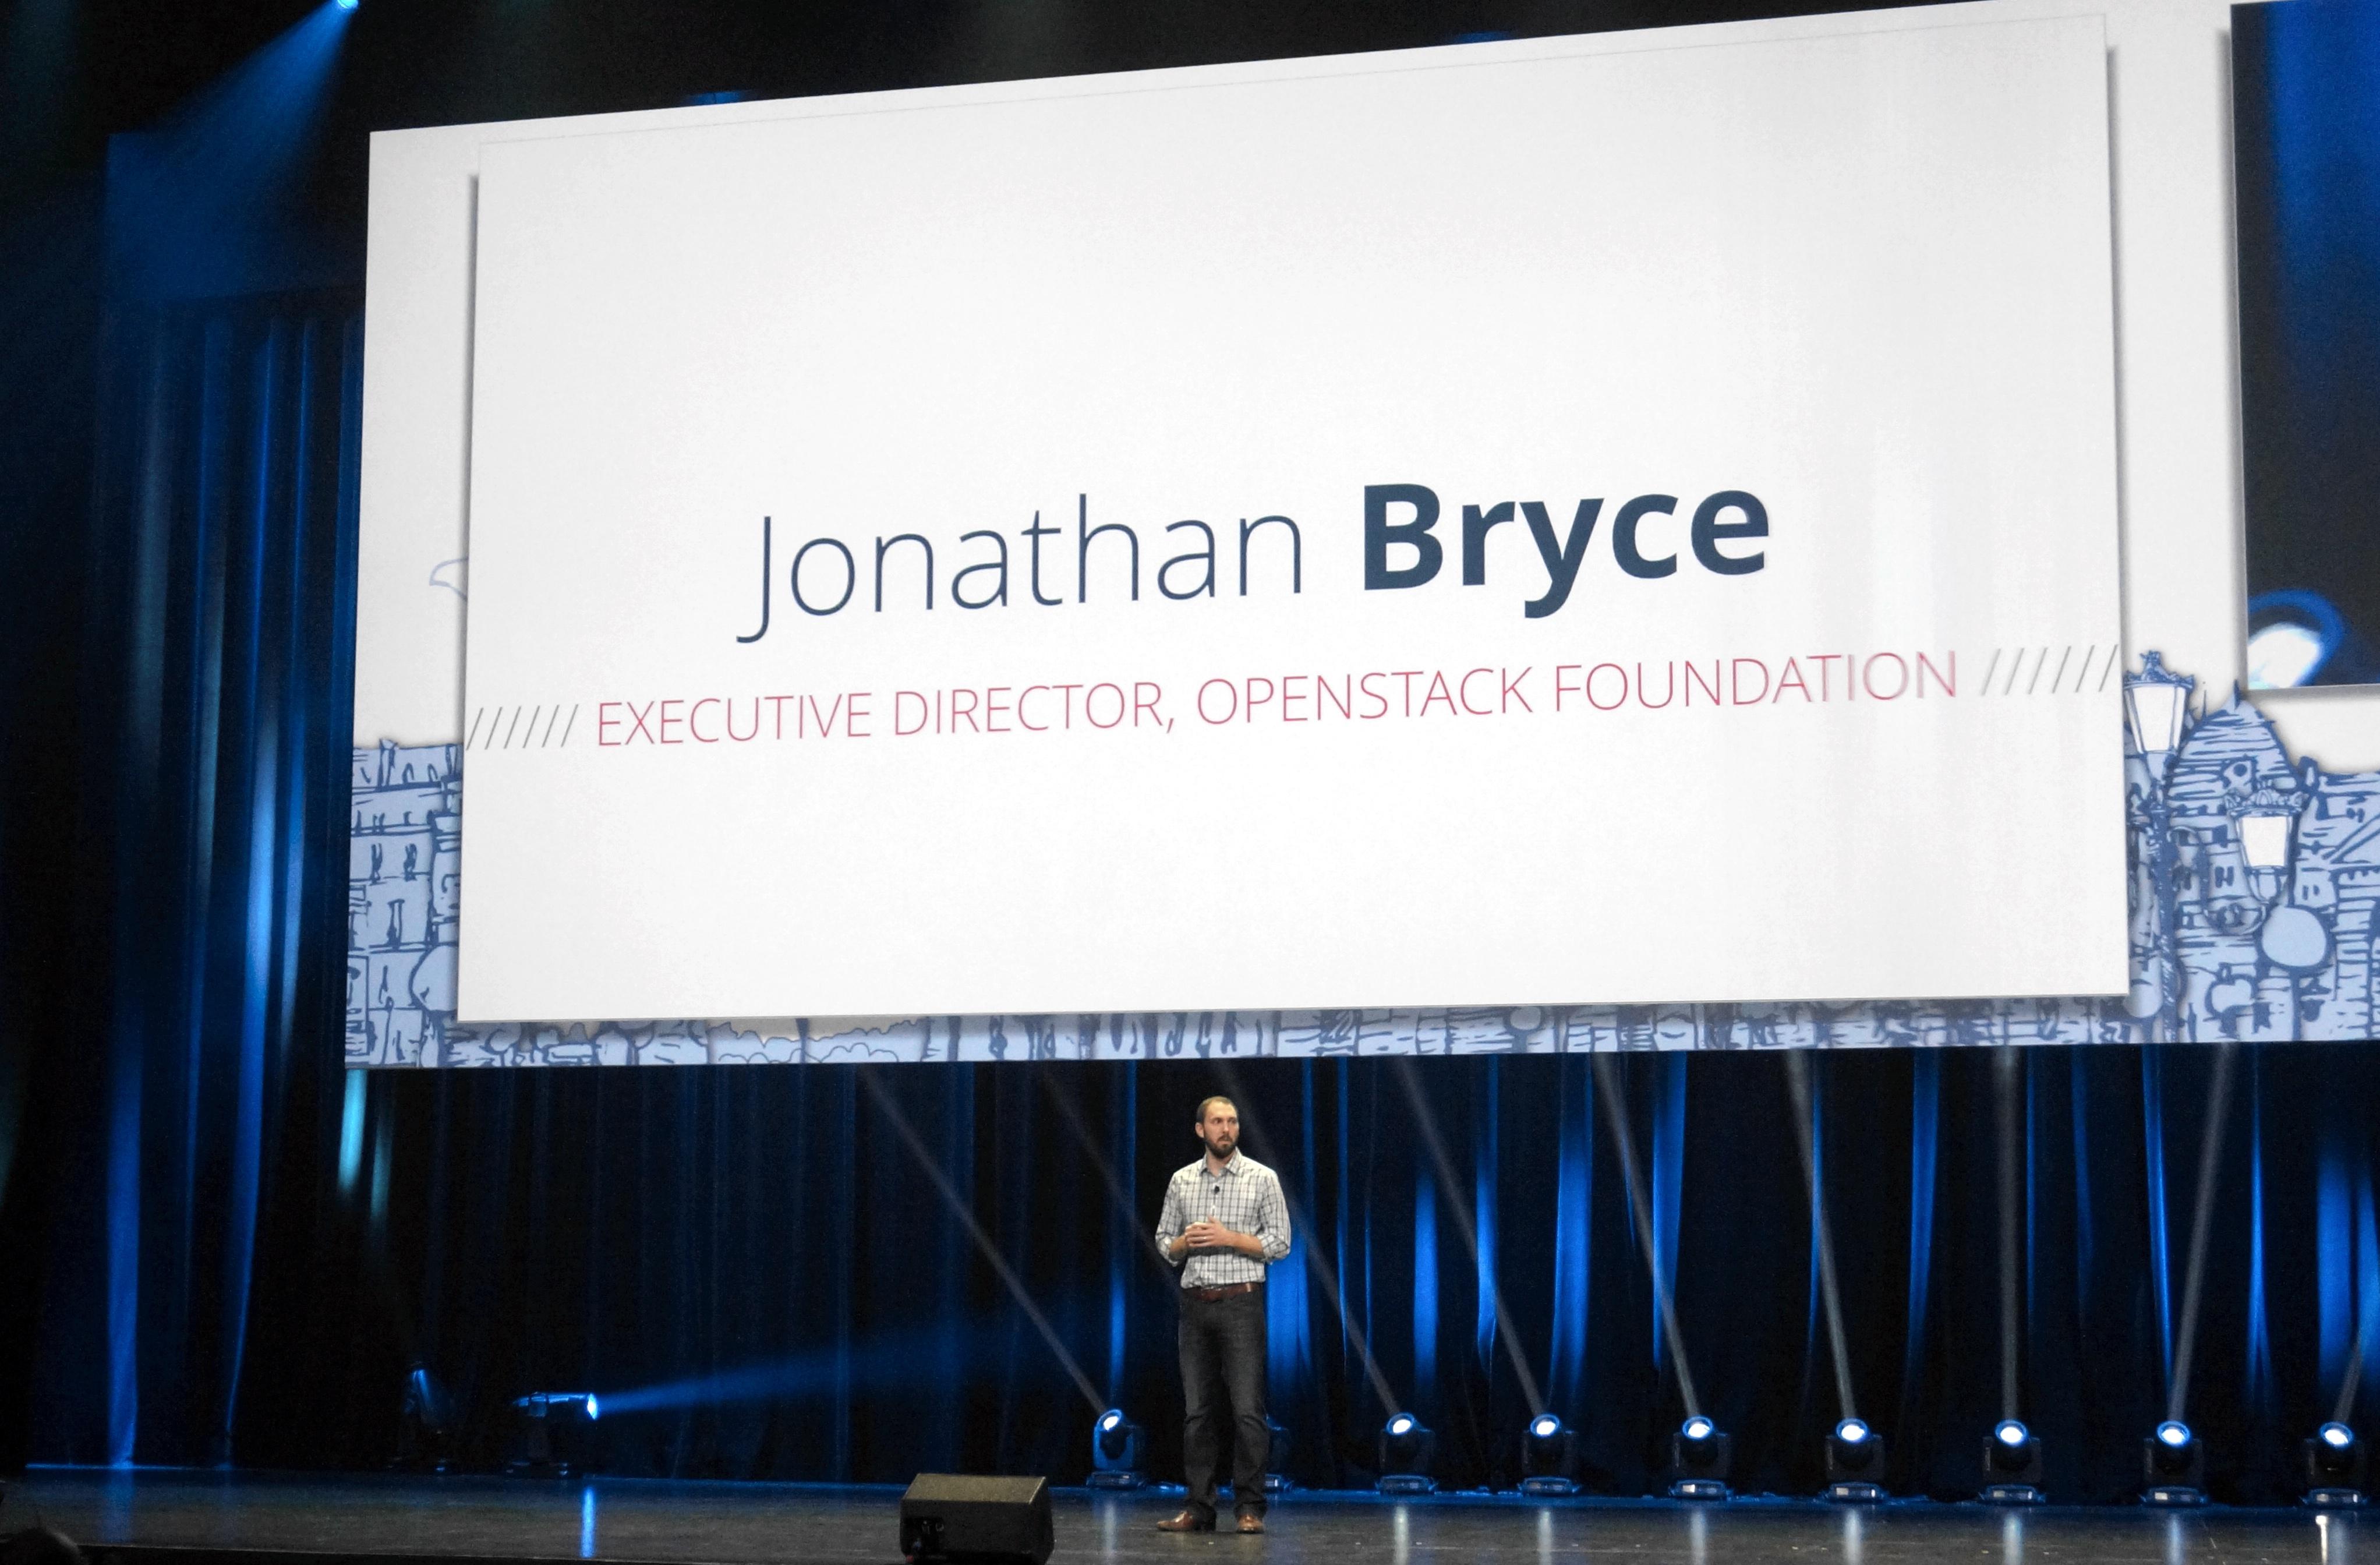 jonathan bryce openstack